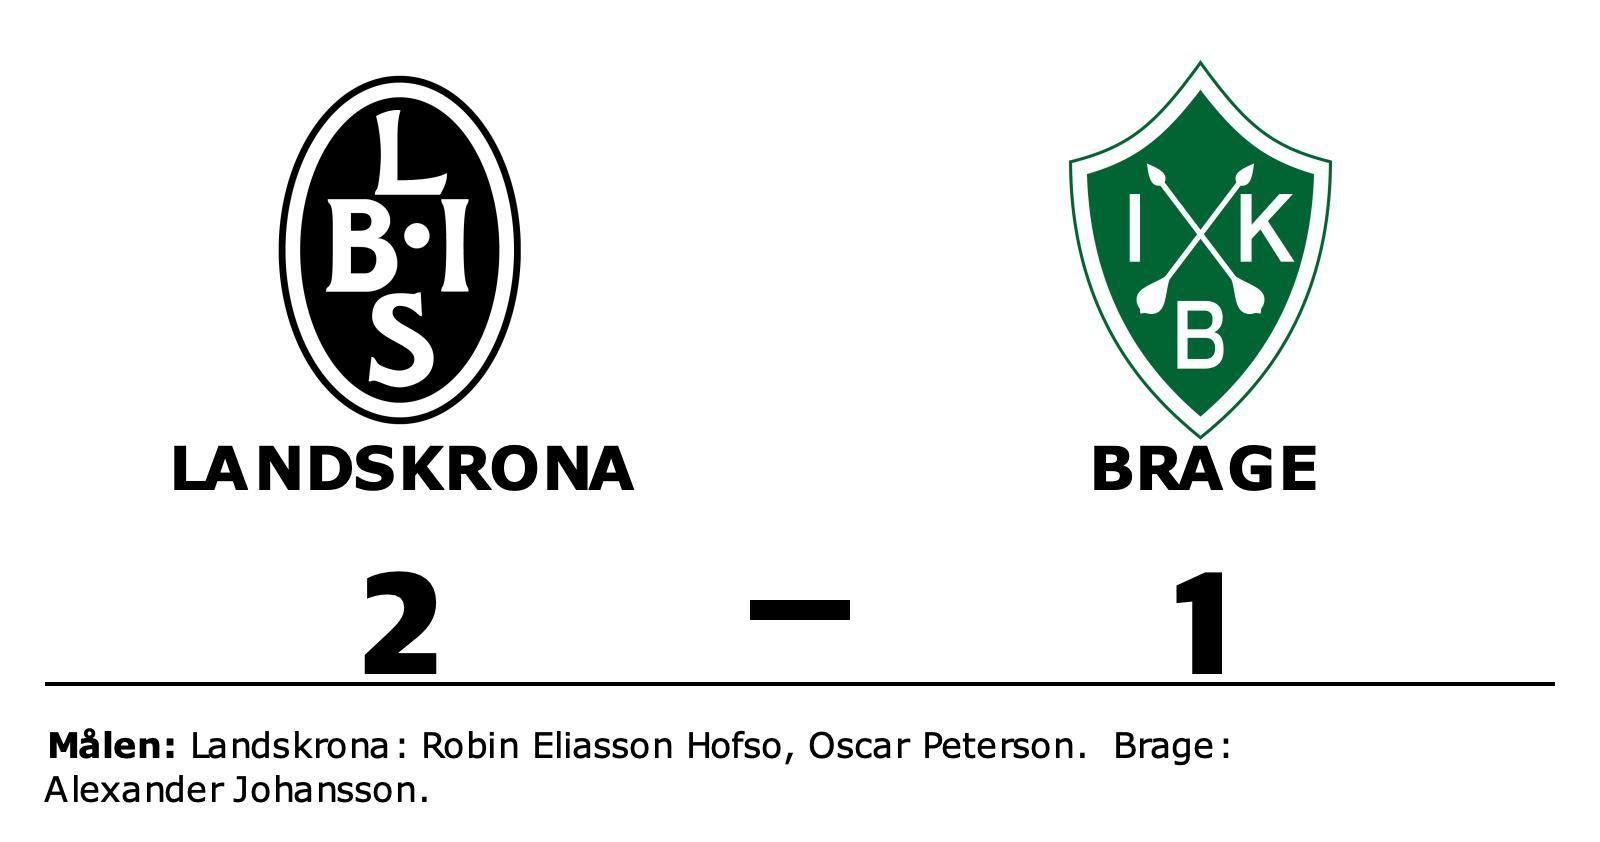 Landskrona ny serieledare efter 2-1 mot Brage